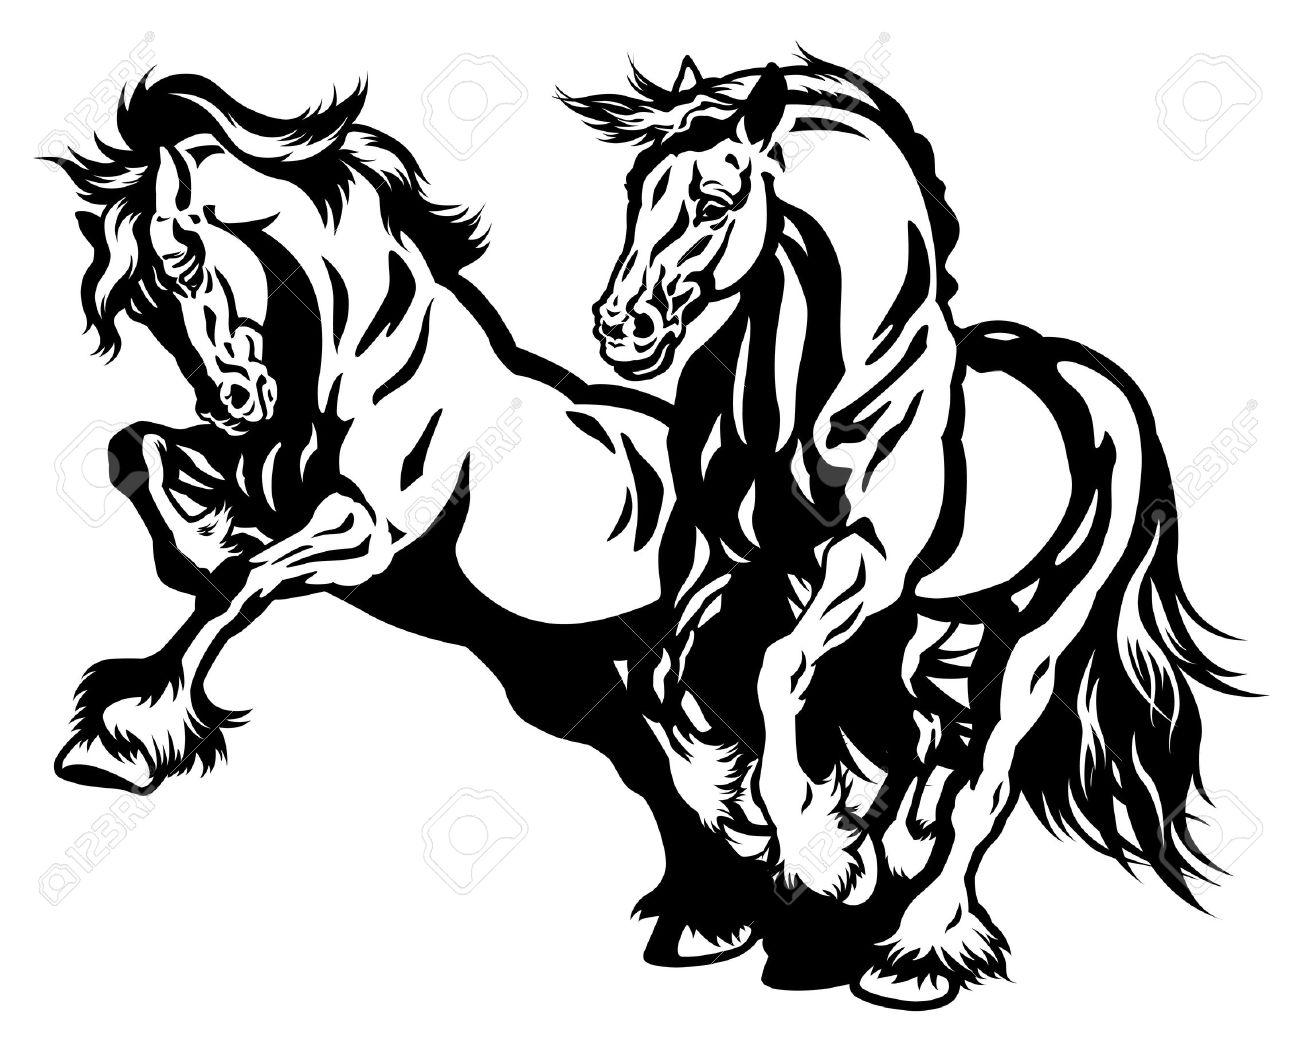 1300x1060 Silhouette Draft Horse Seens